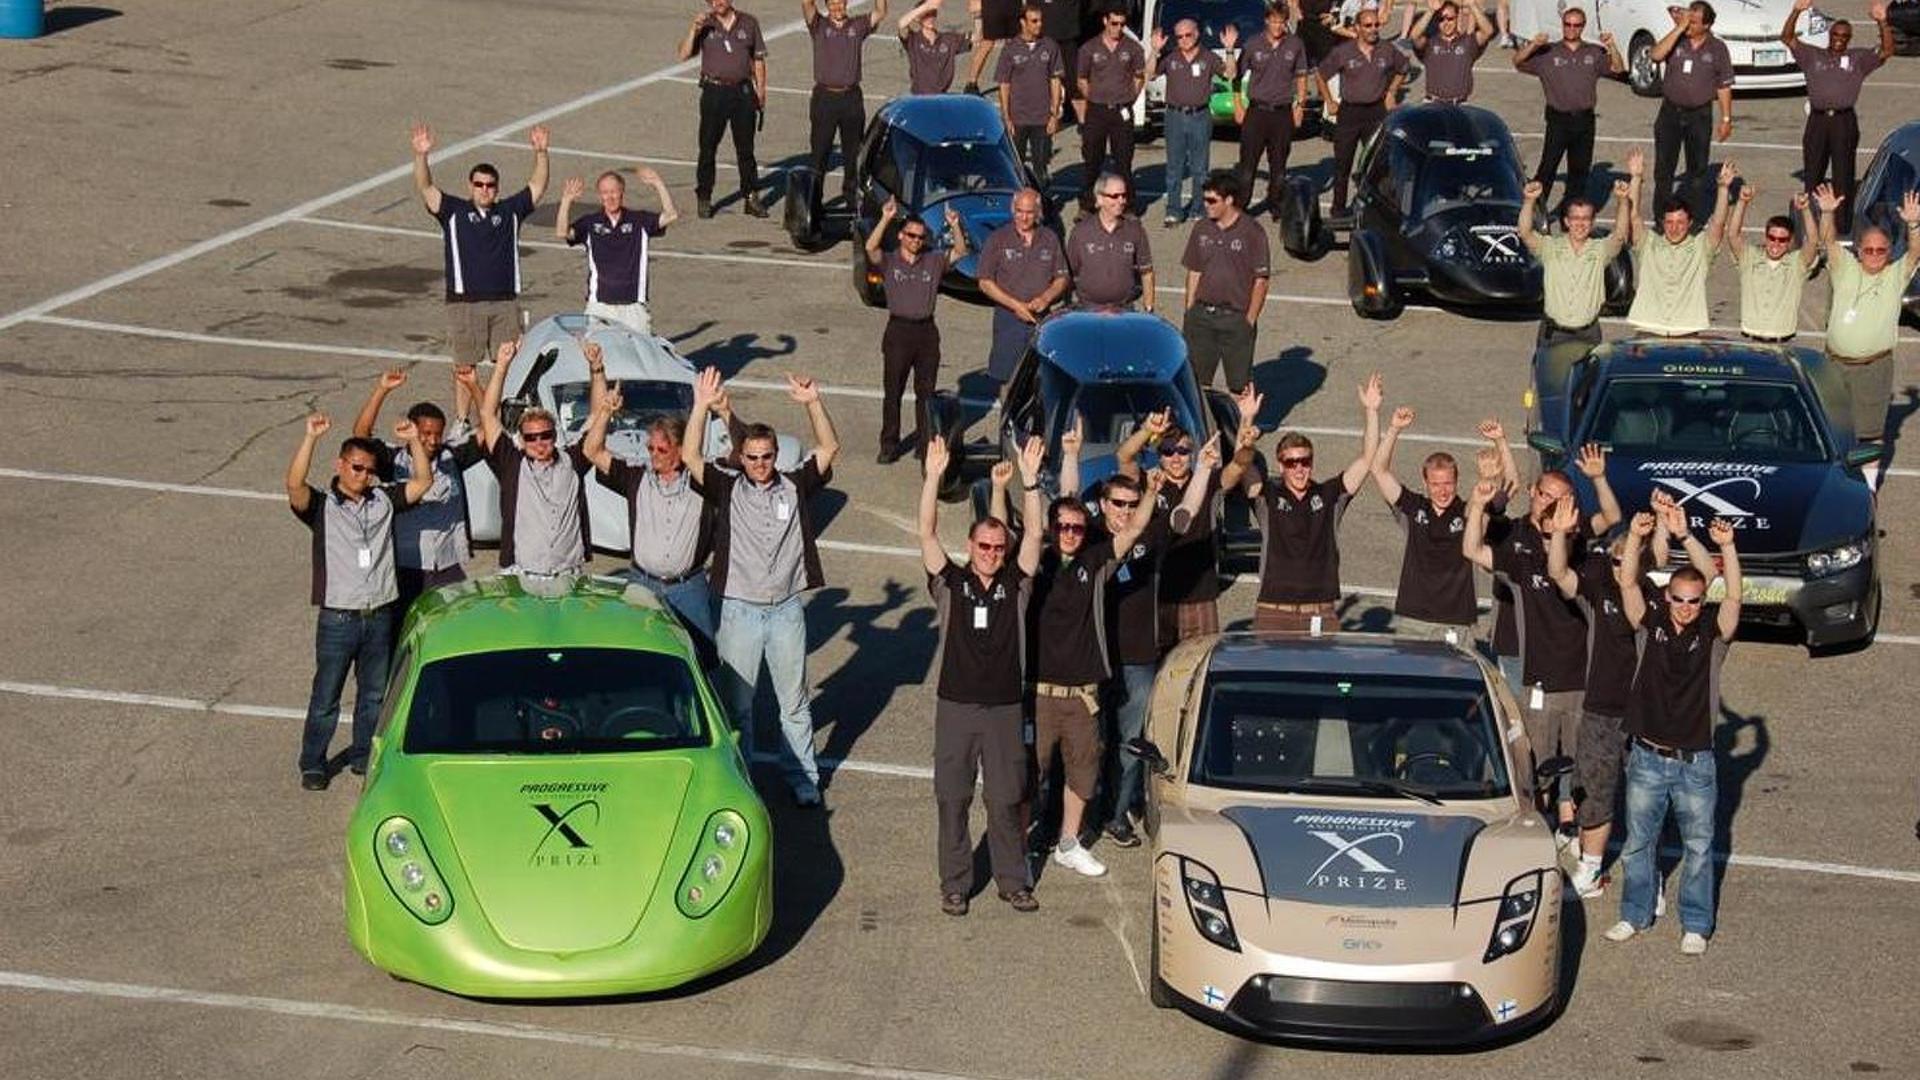 Automotive X PRIZE winners announced